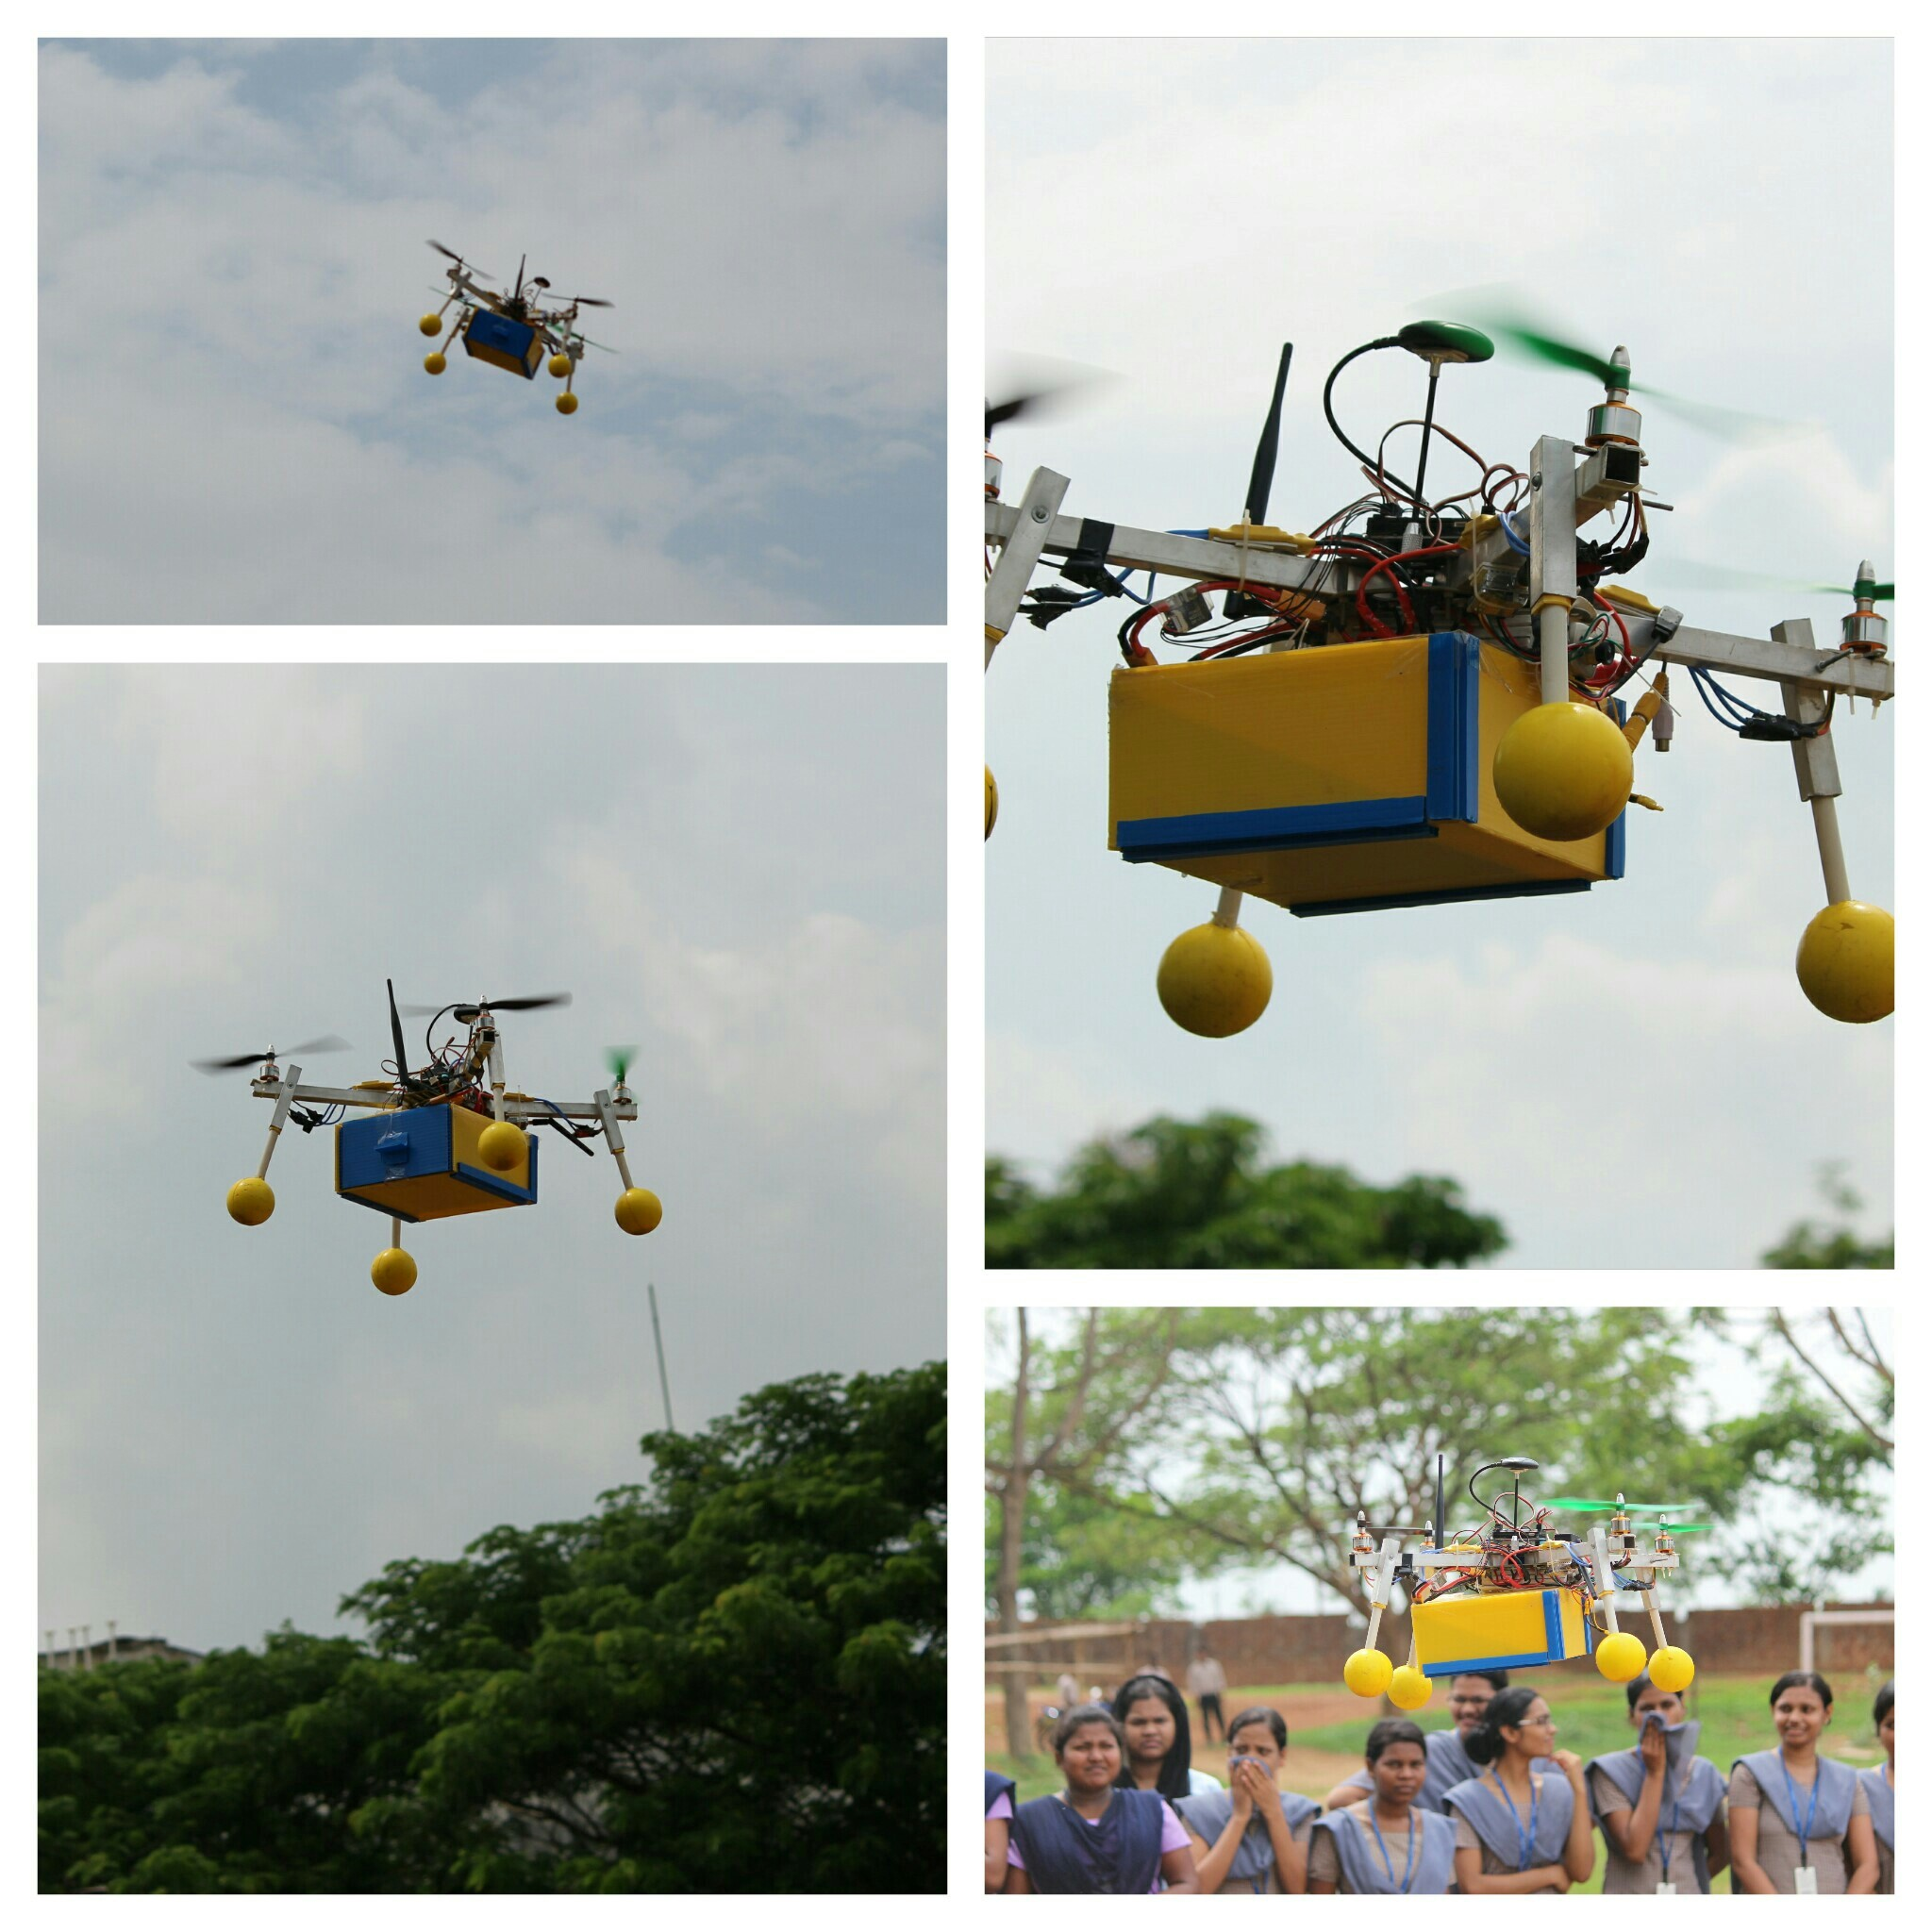 Firewings Drone bhubaneswar buzz 2